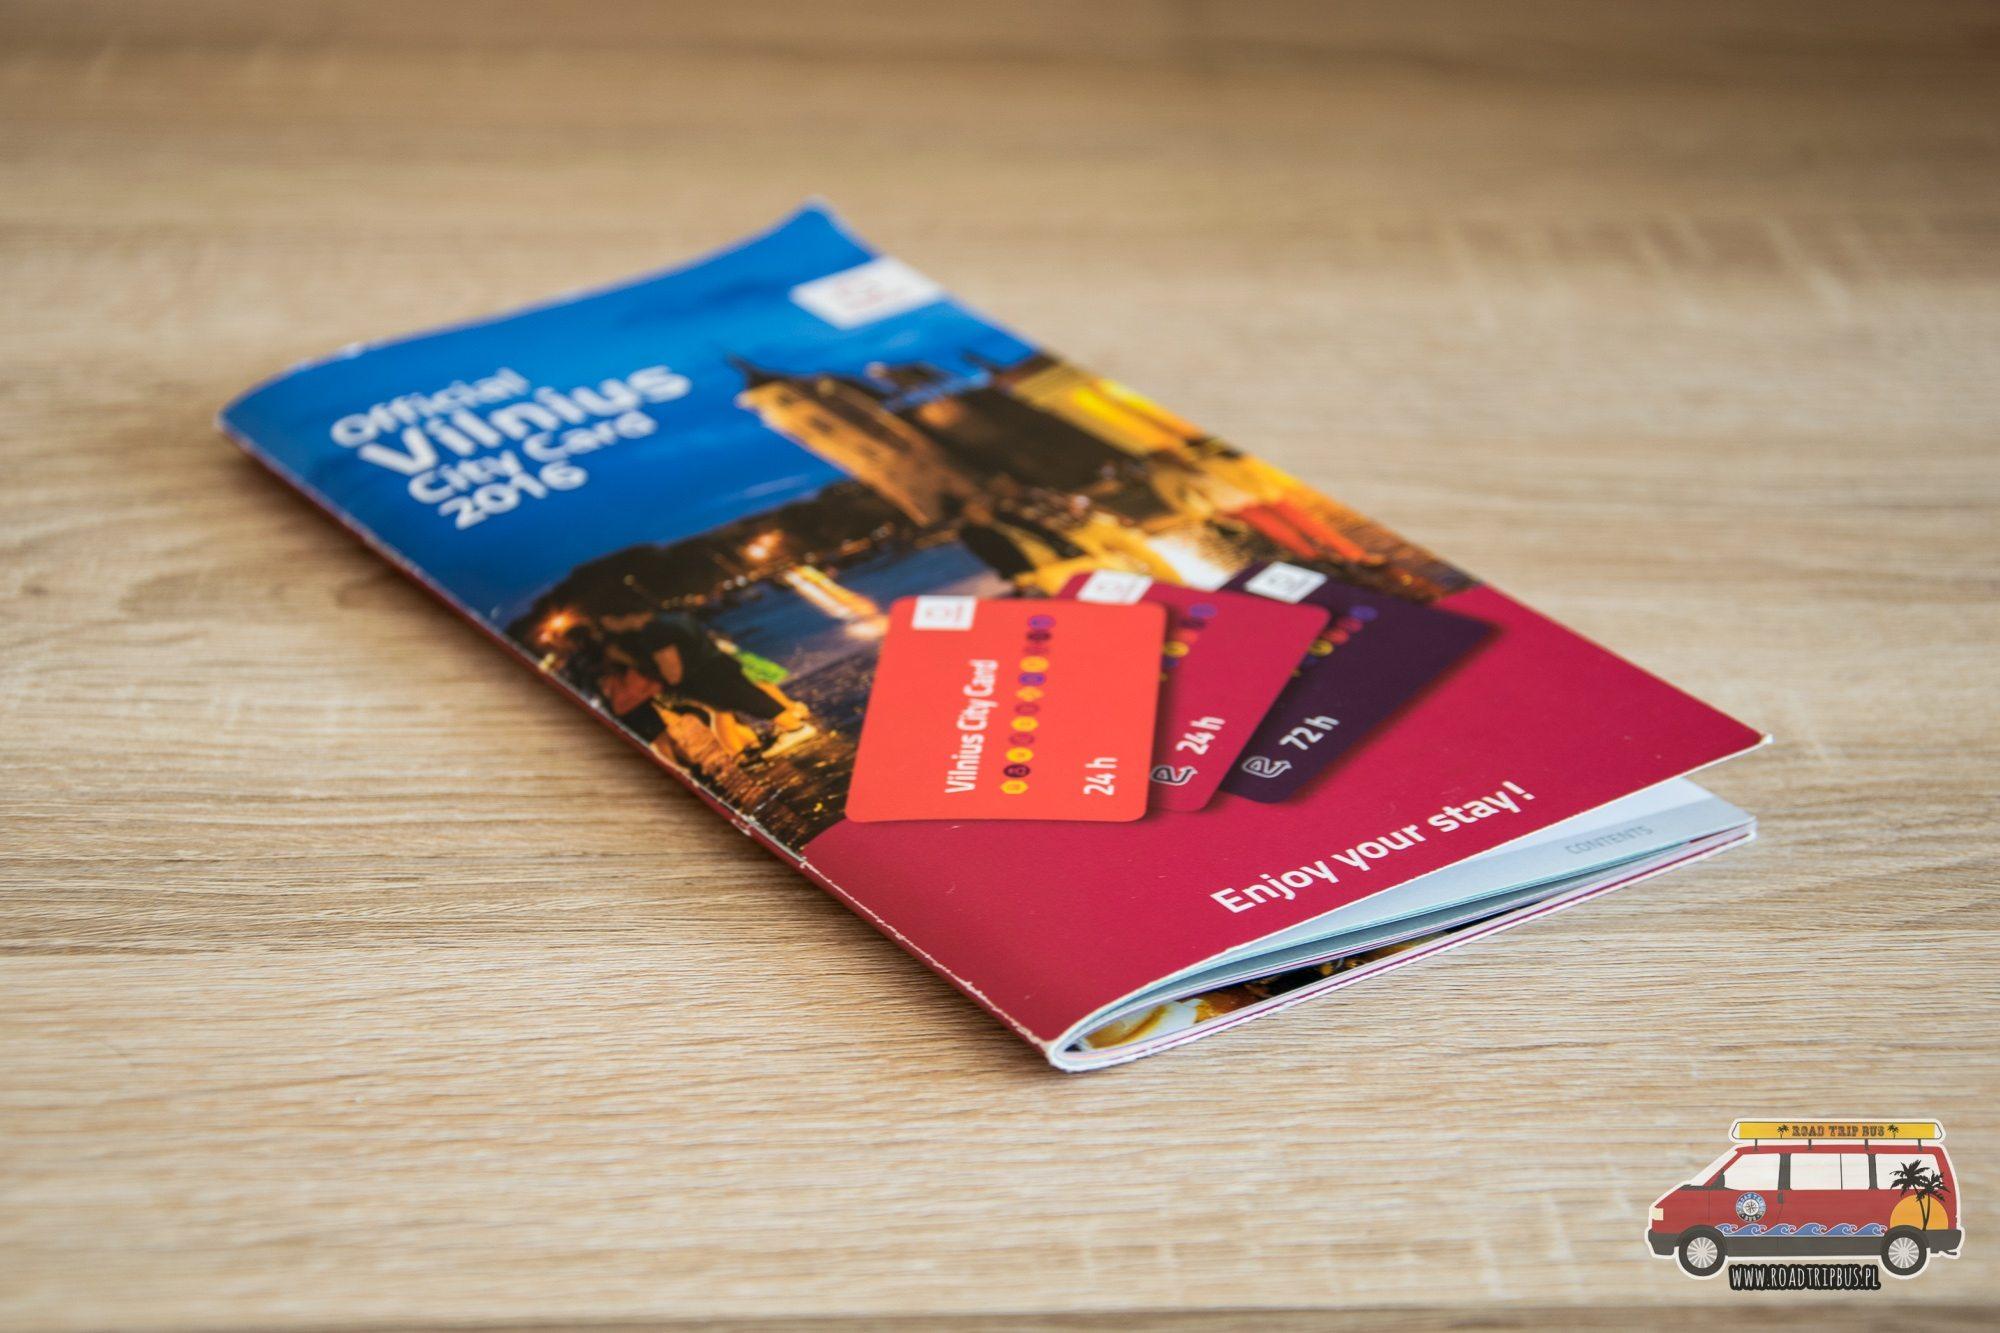 vilnius city card katalog